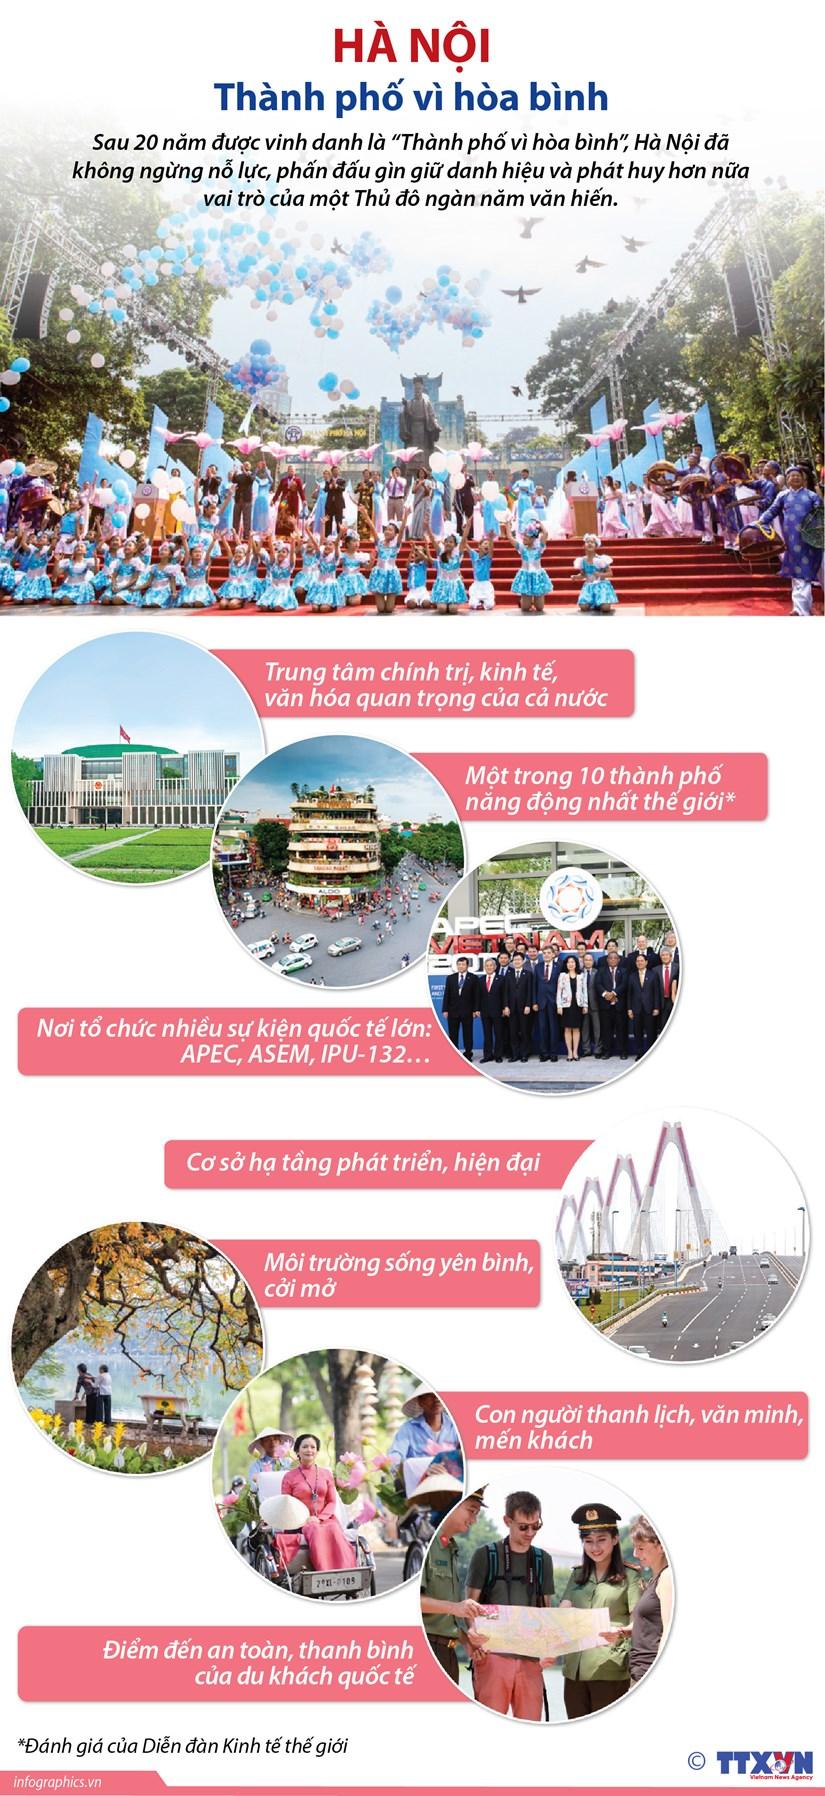 [Infographics] Ha Noi gin giu danh hieu 'Thanh pho vi hoa binh' hinh anh 1